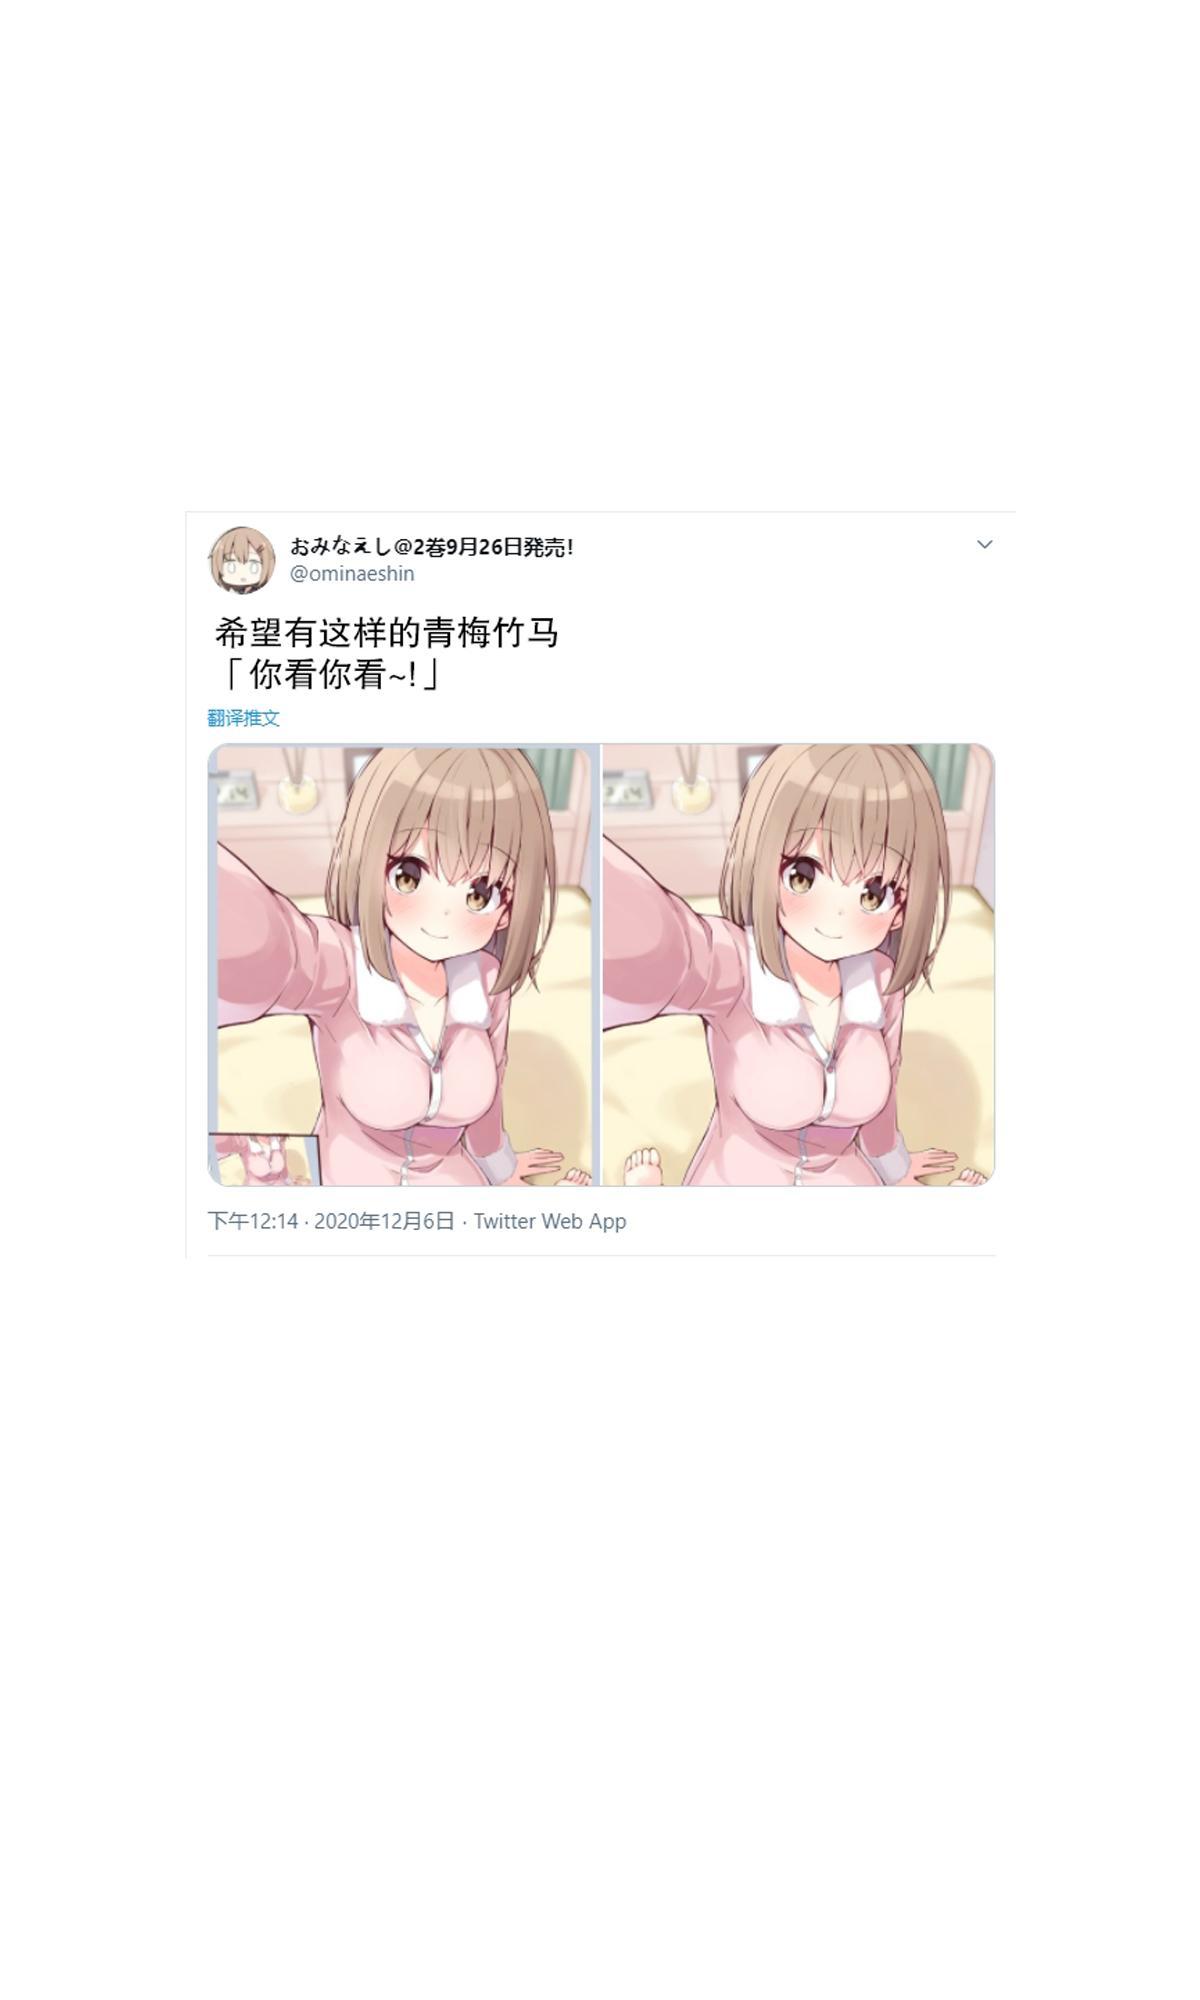 Konna Osananajimi ga Ite hoshii | 想要这样的青梅竹马 14